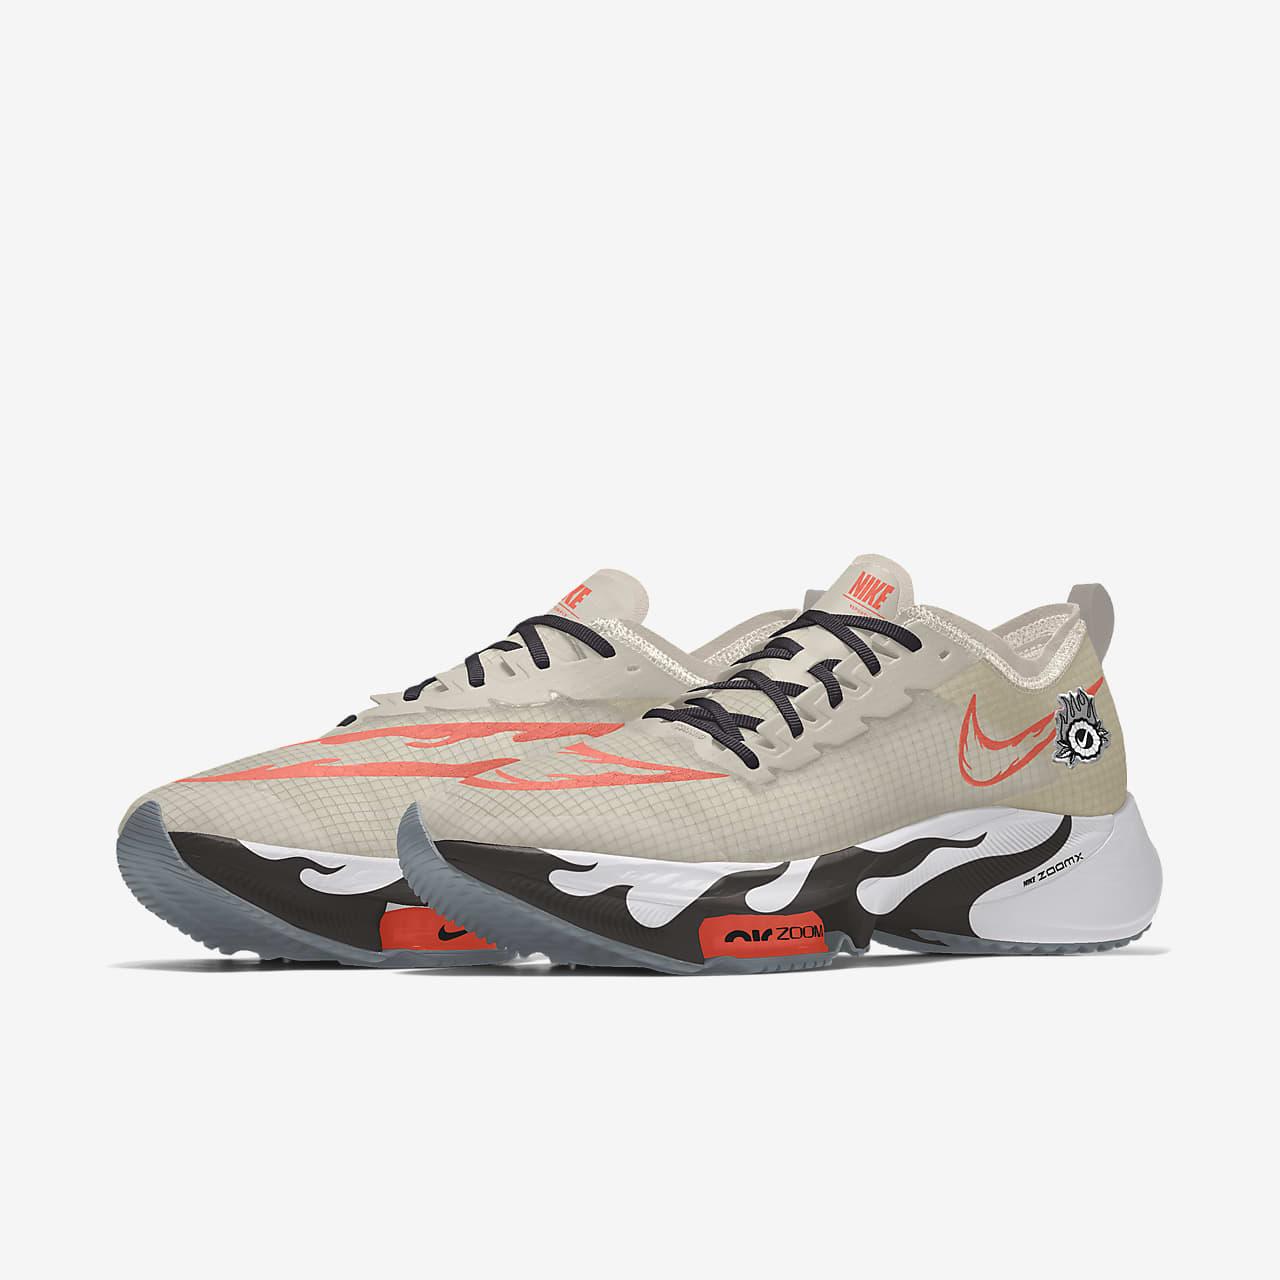 Nike Air Zoom Tempo Next% By You Custom